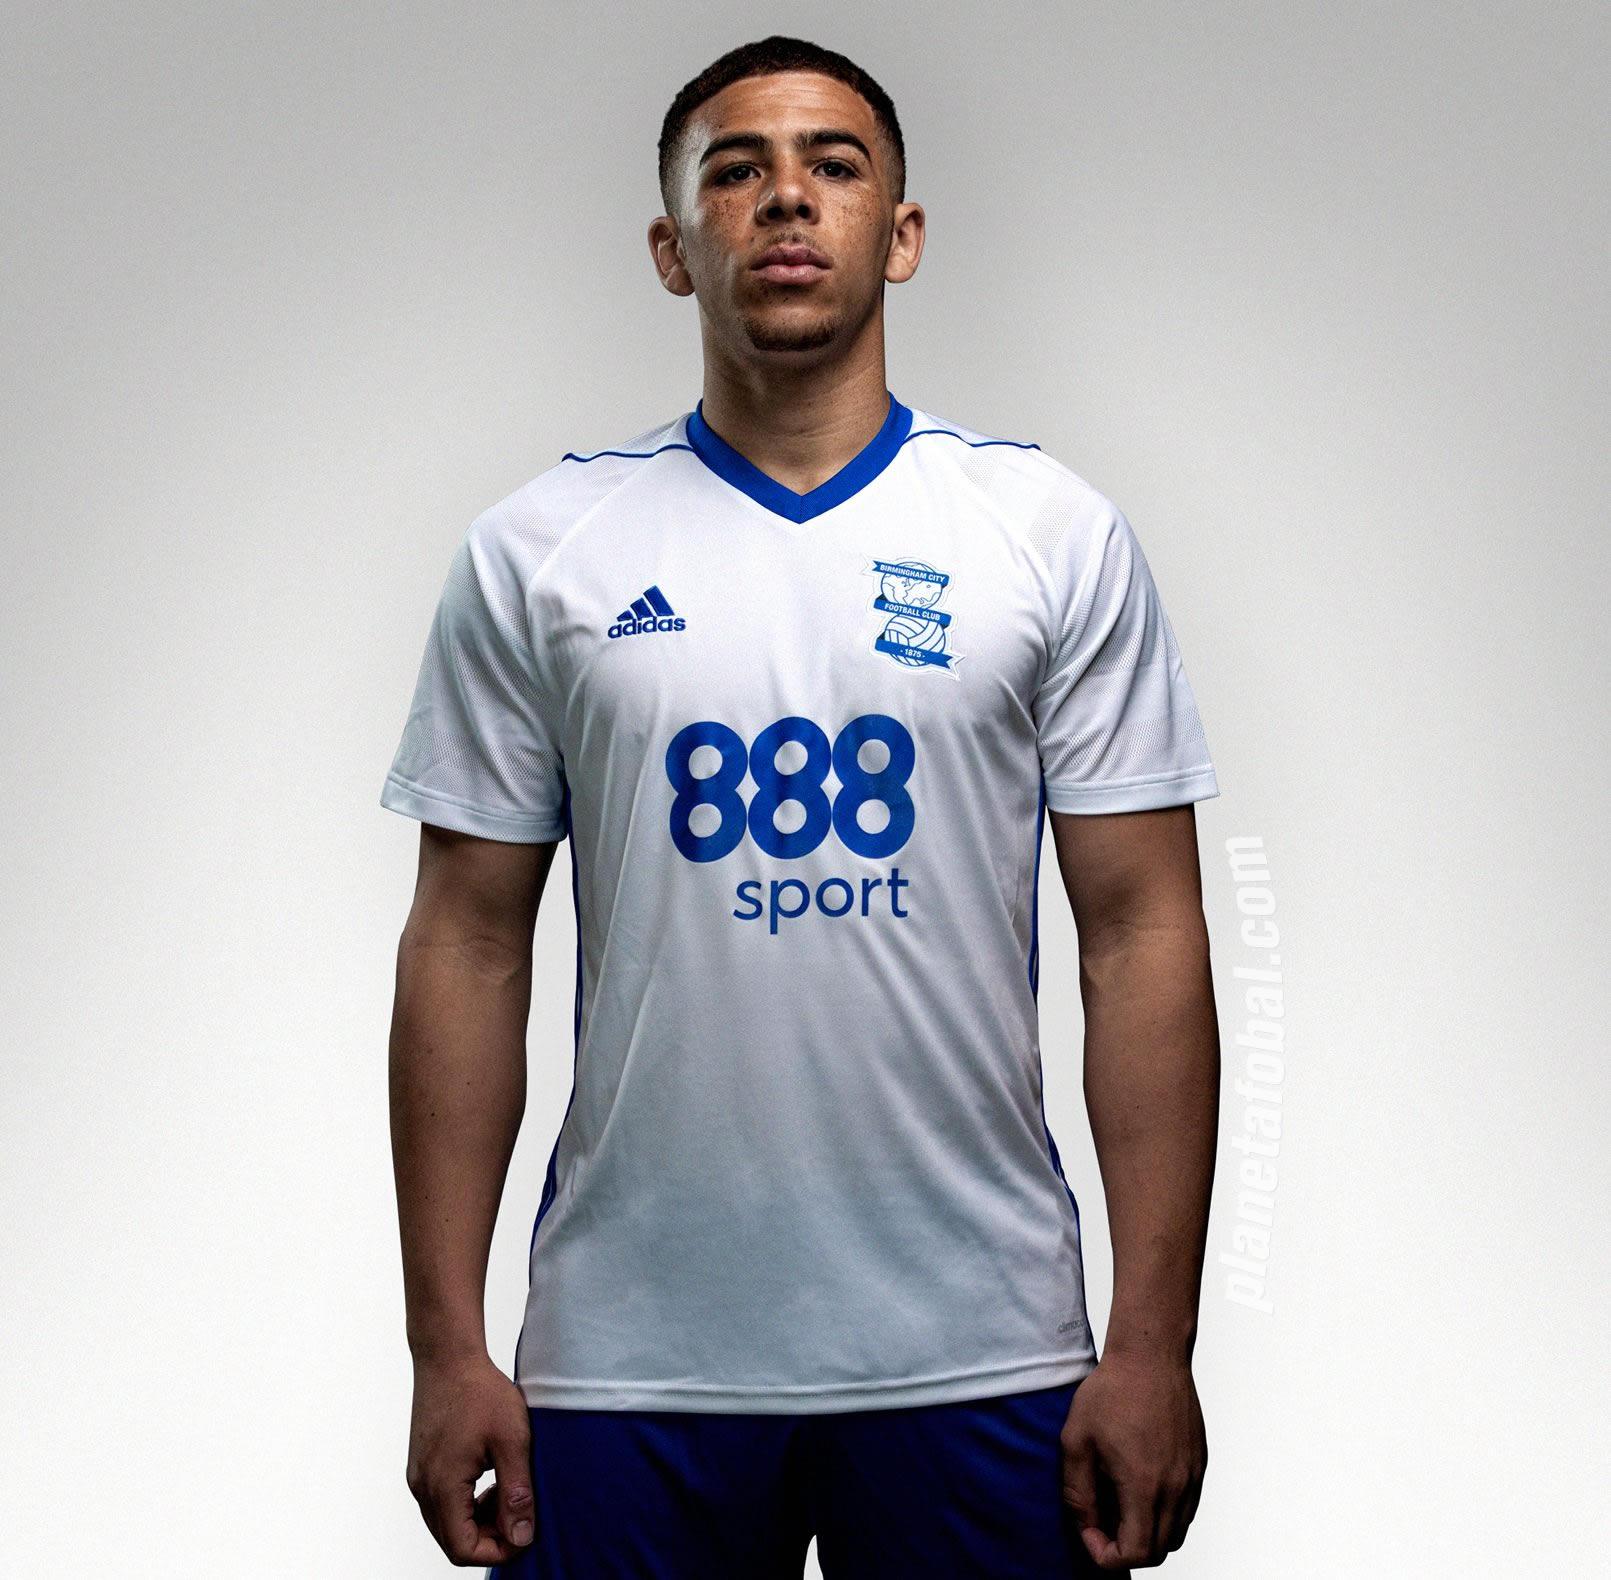 Camiseta suplente Adidas 2017-18 del Birmingham City FC | Foto Web Oficial